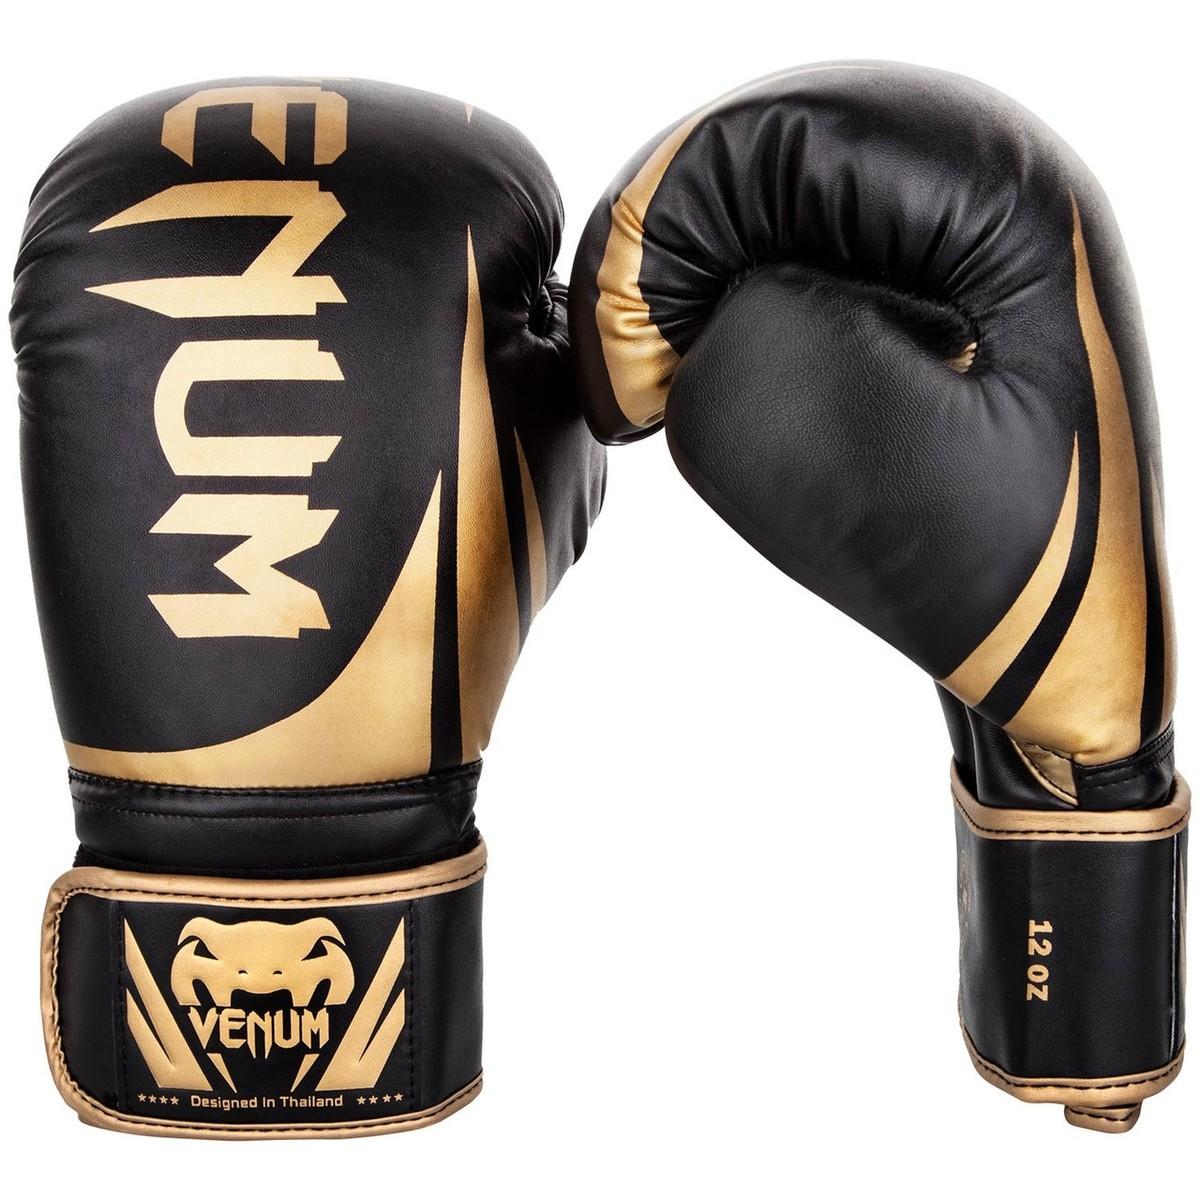 Venum Challenger 2.0 Boxing Gloves Gloves Boxing 4877eb